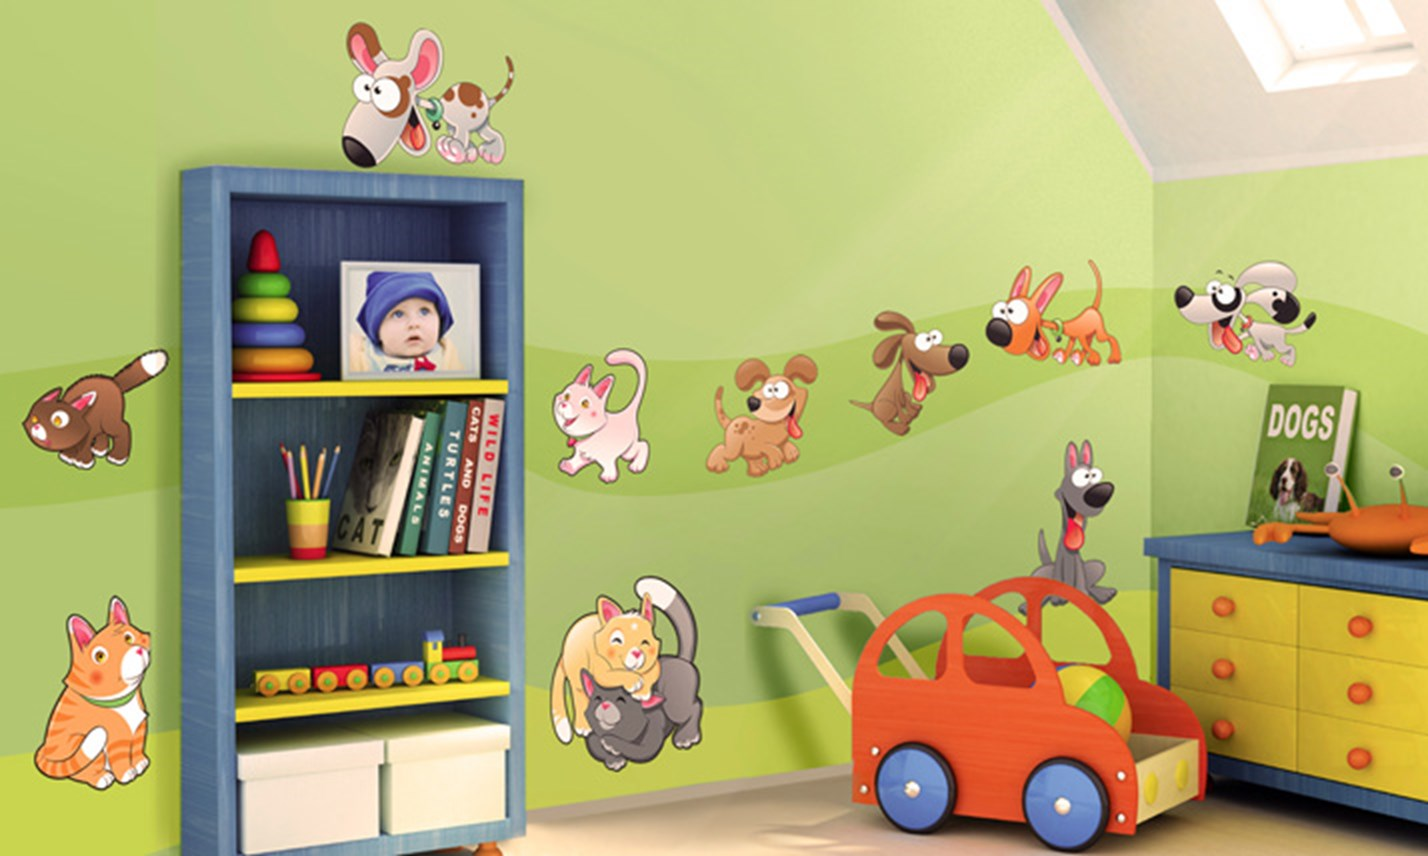 Decorazioni muri camerette bambini bimbi fantasia - Muri camerette bambini ...